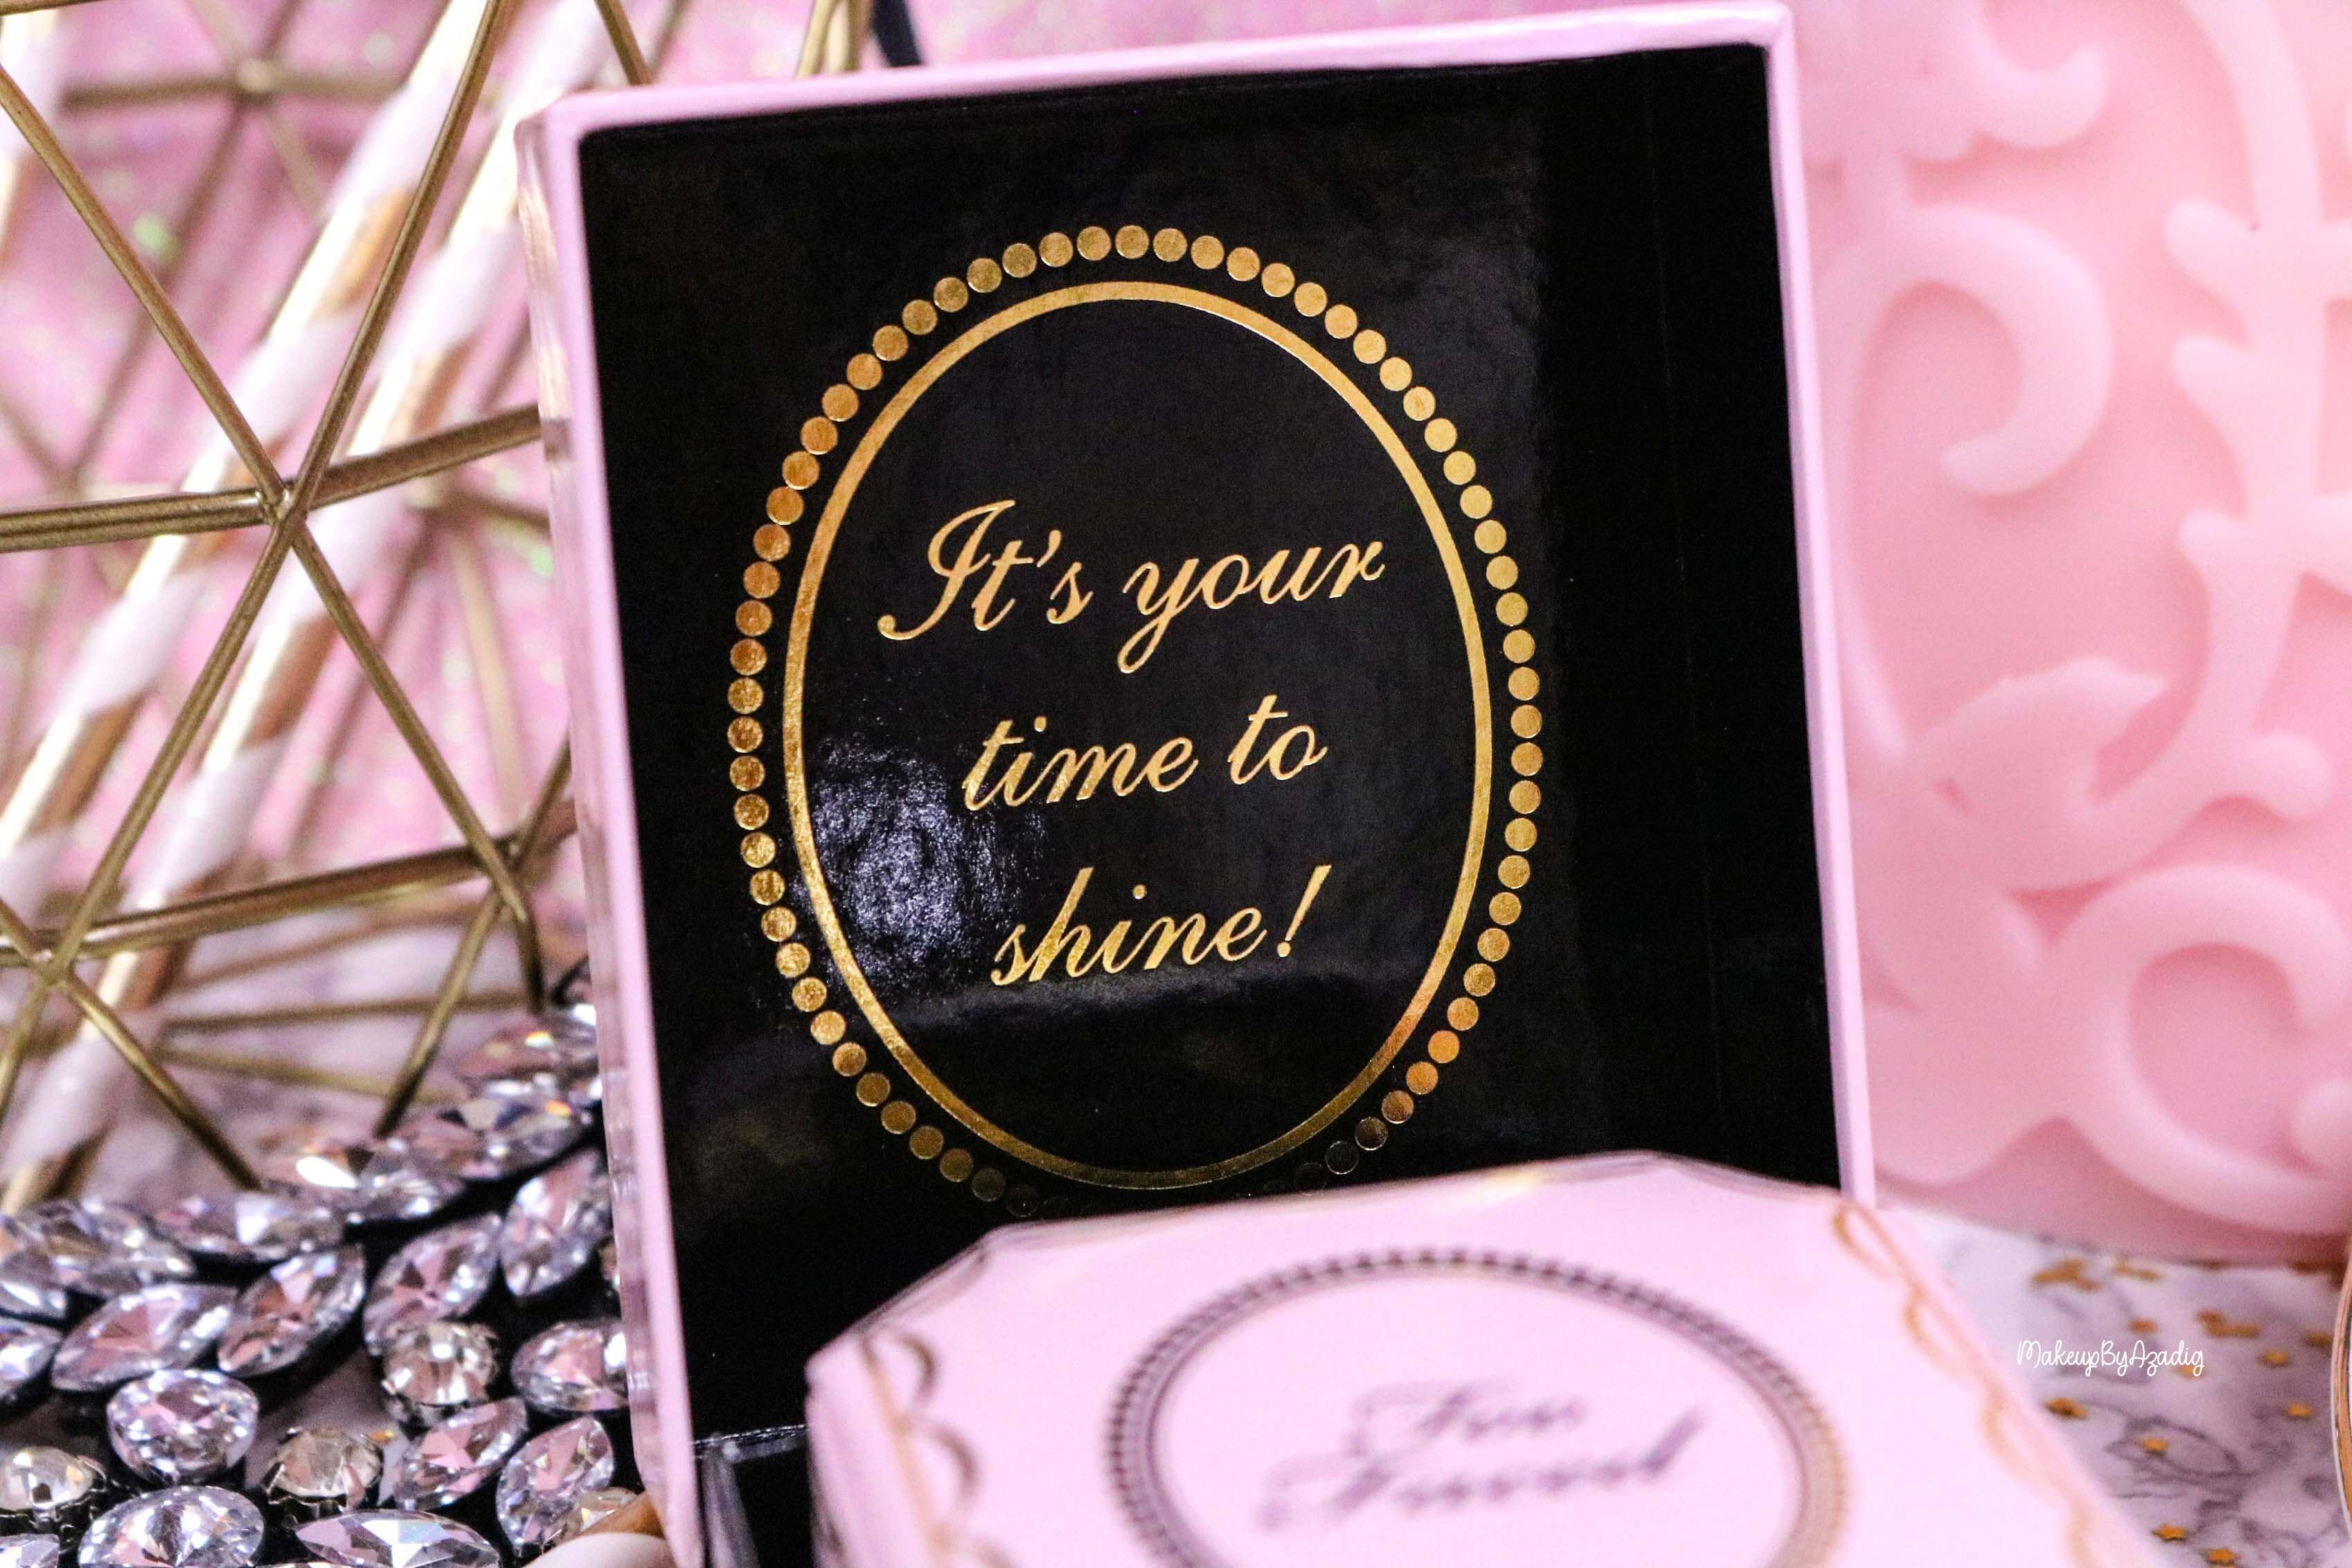 revue-highlighter-diamond-light-toofaced-enlumineur-diamant-collection-makeup-makeupbyazadig-sortie-france-influencer-swatch-avis-prix-mariage